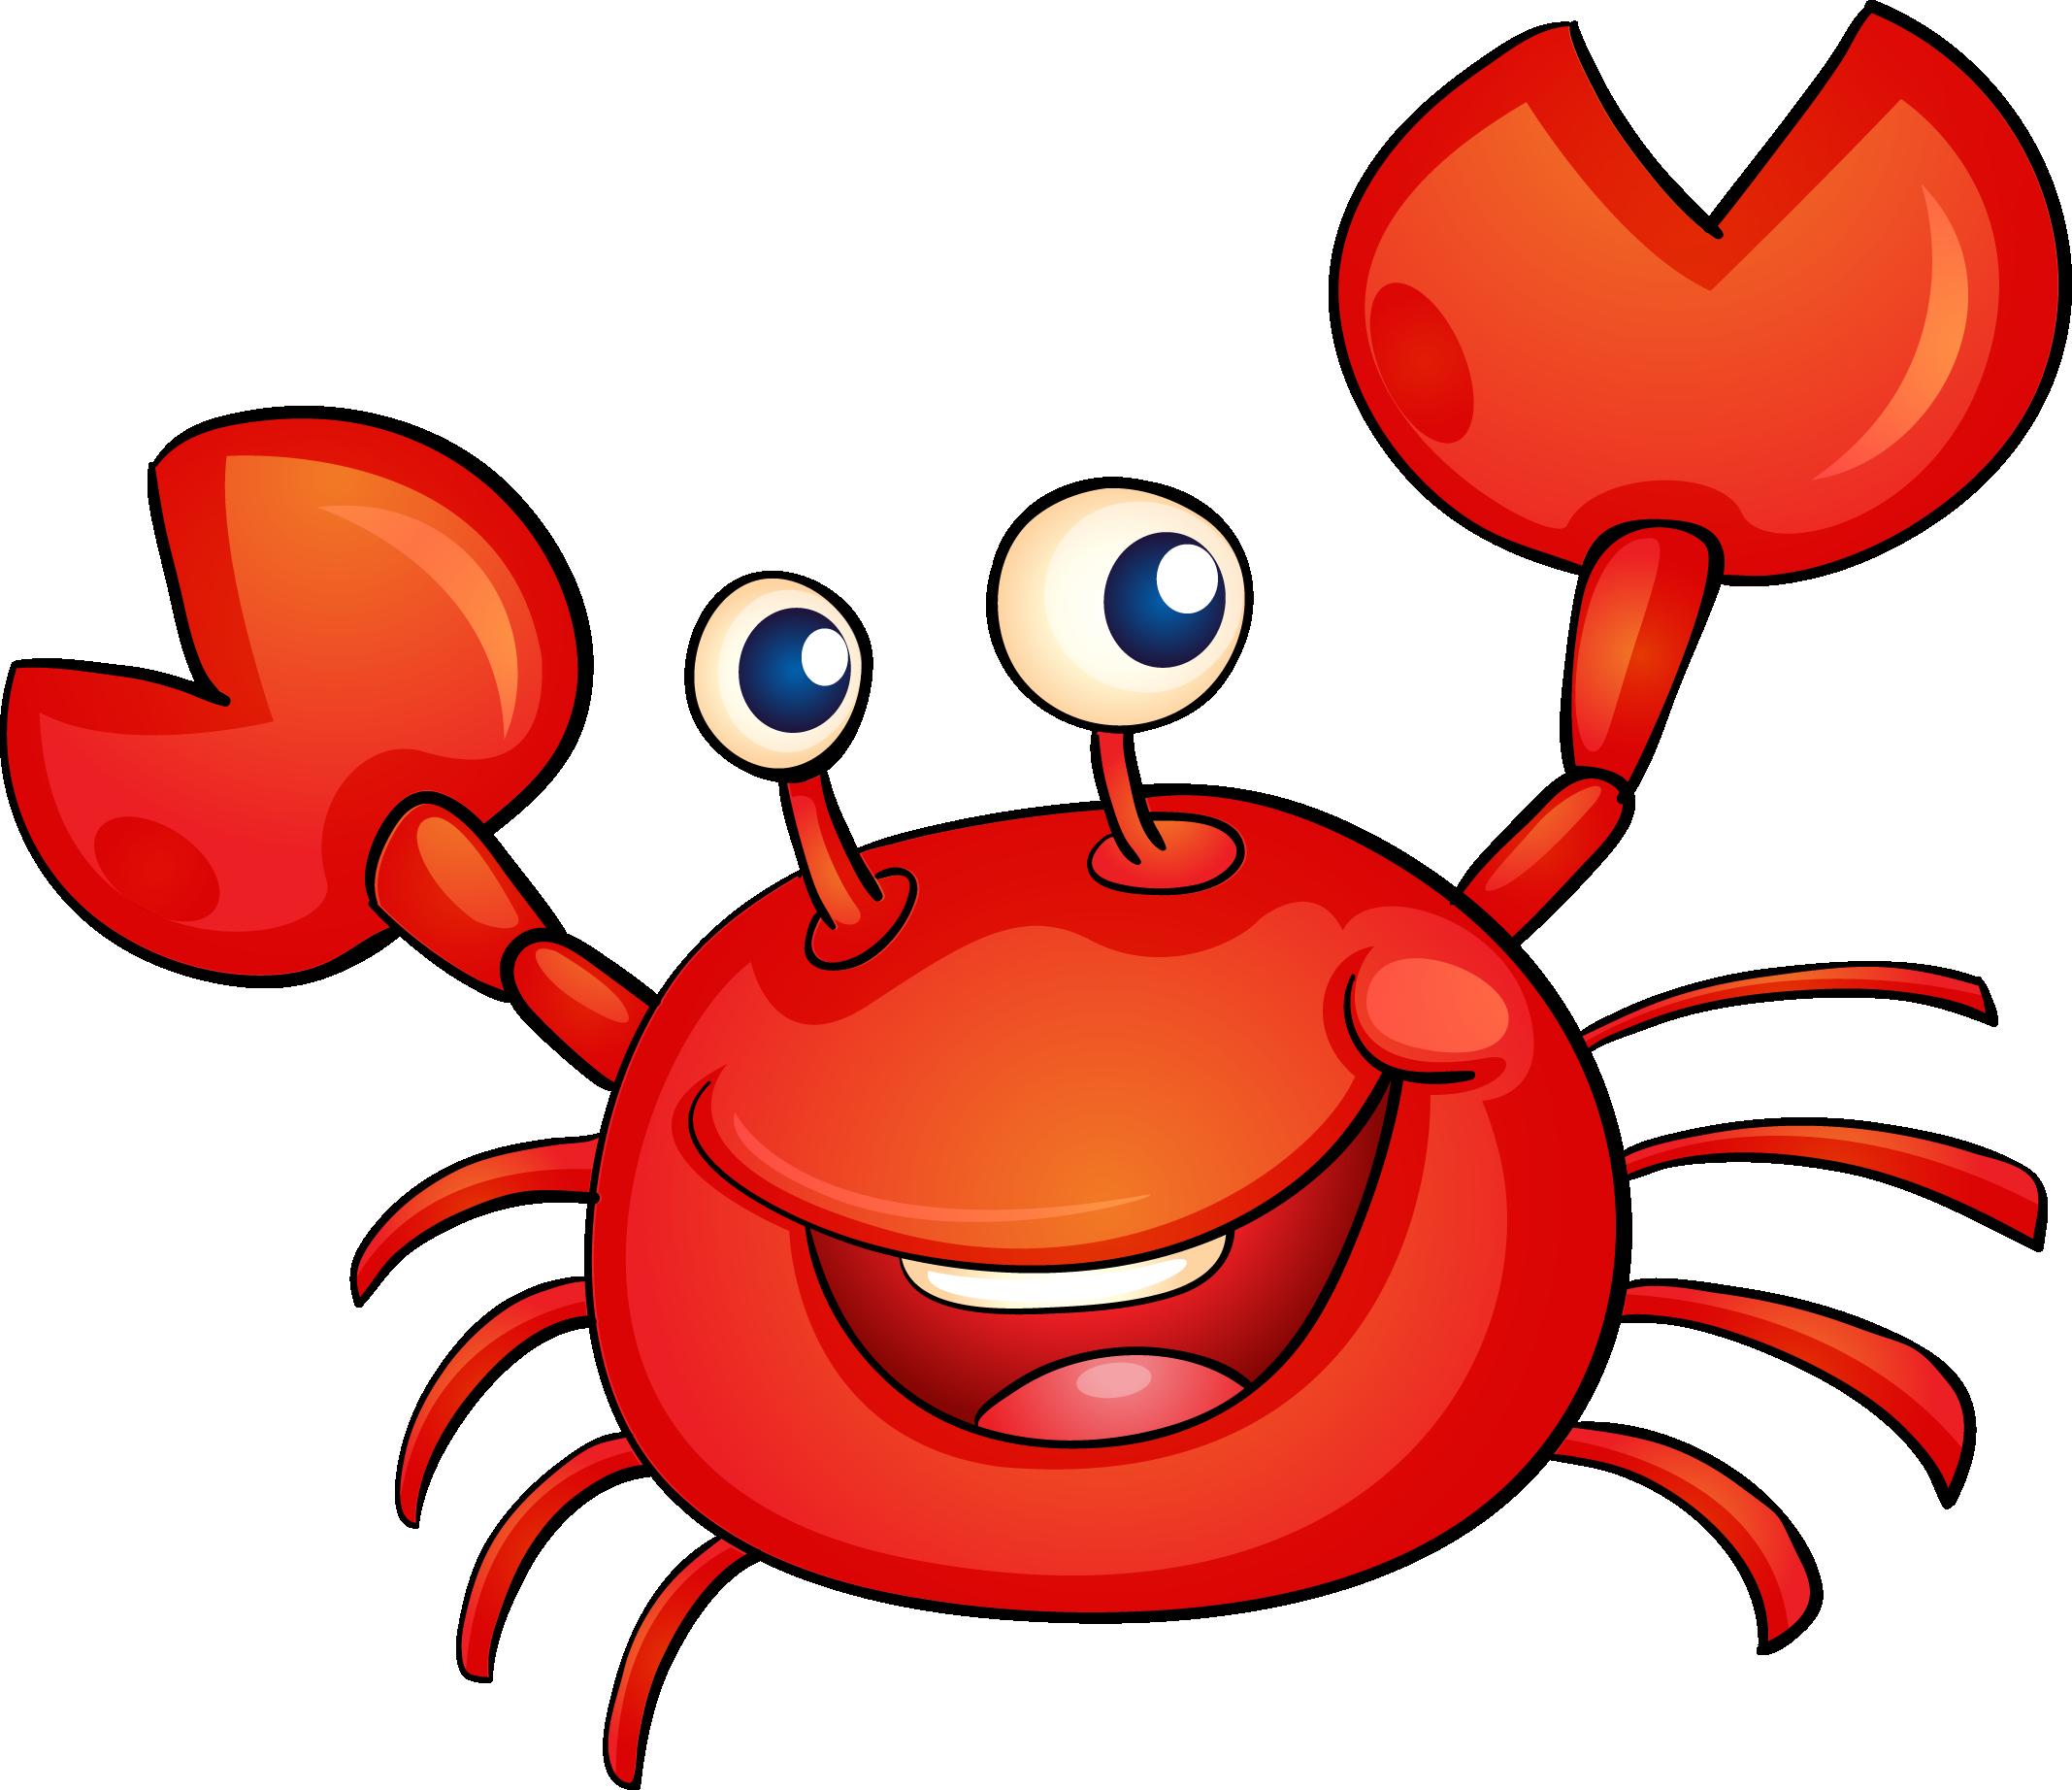 Crab Cartoon Illustration.